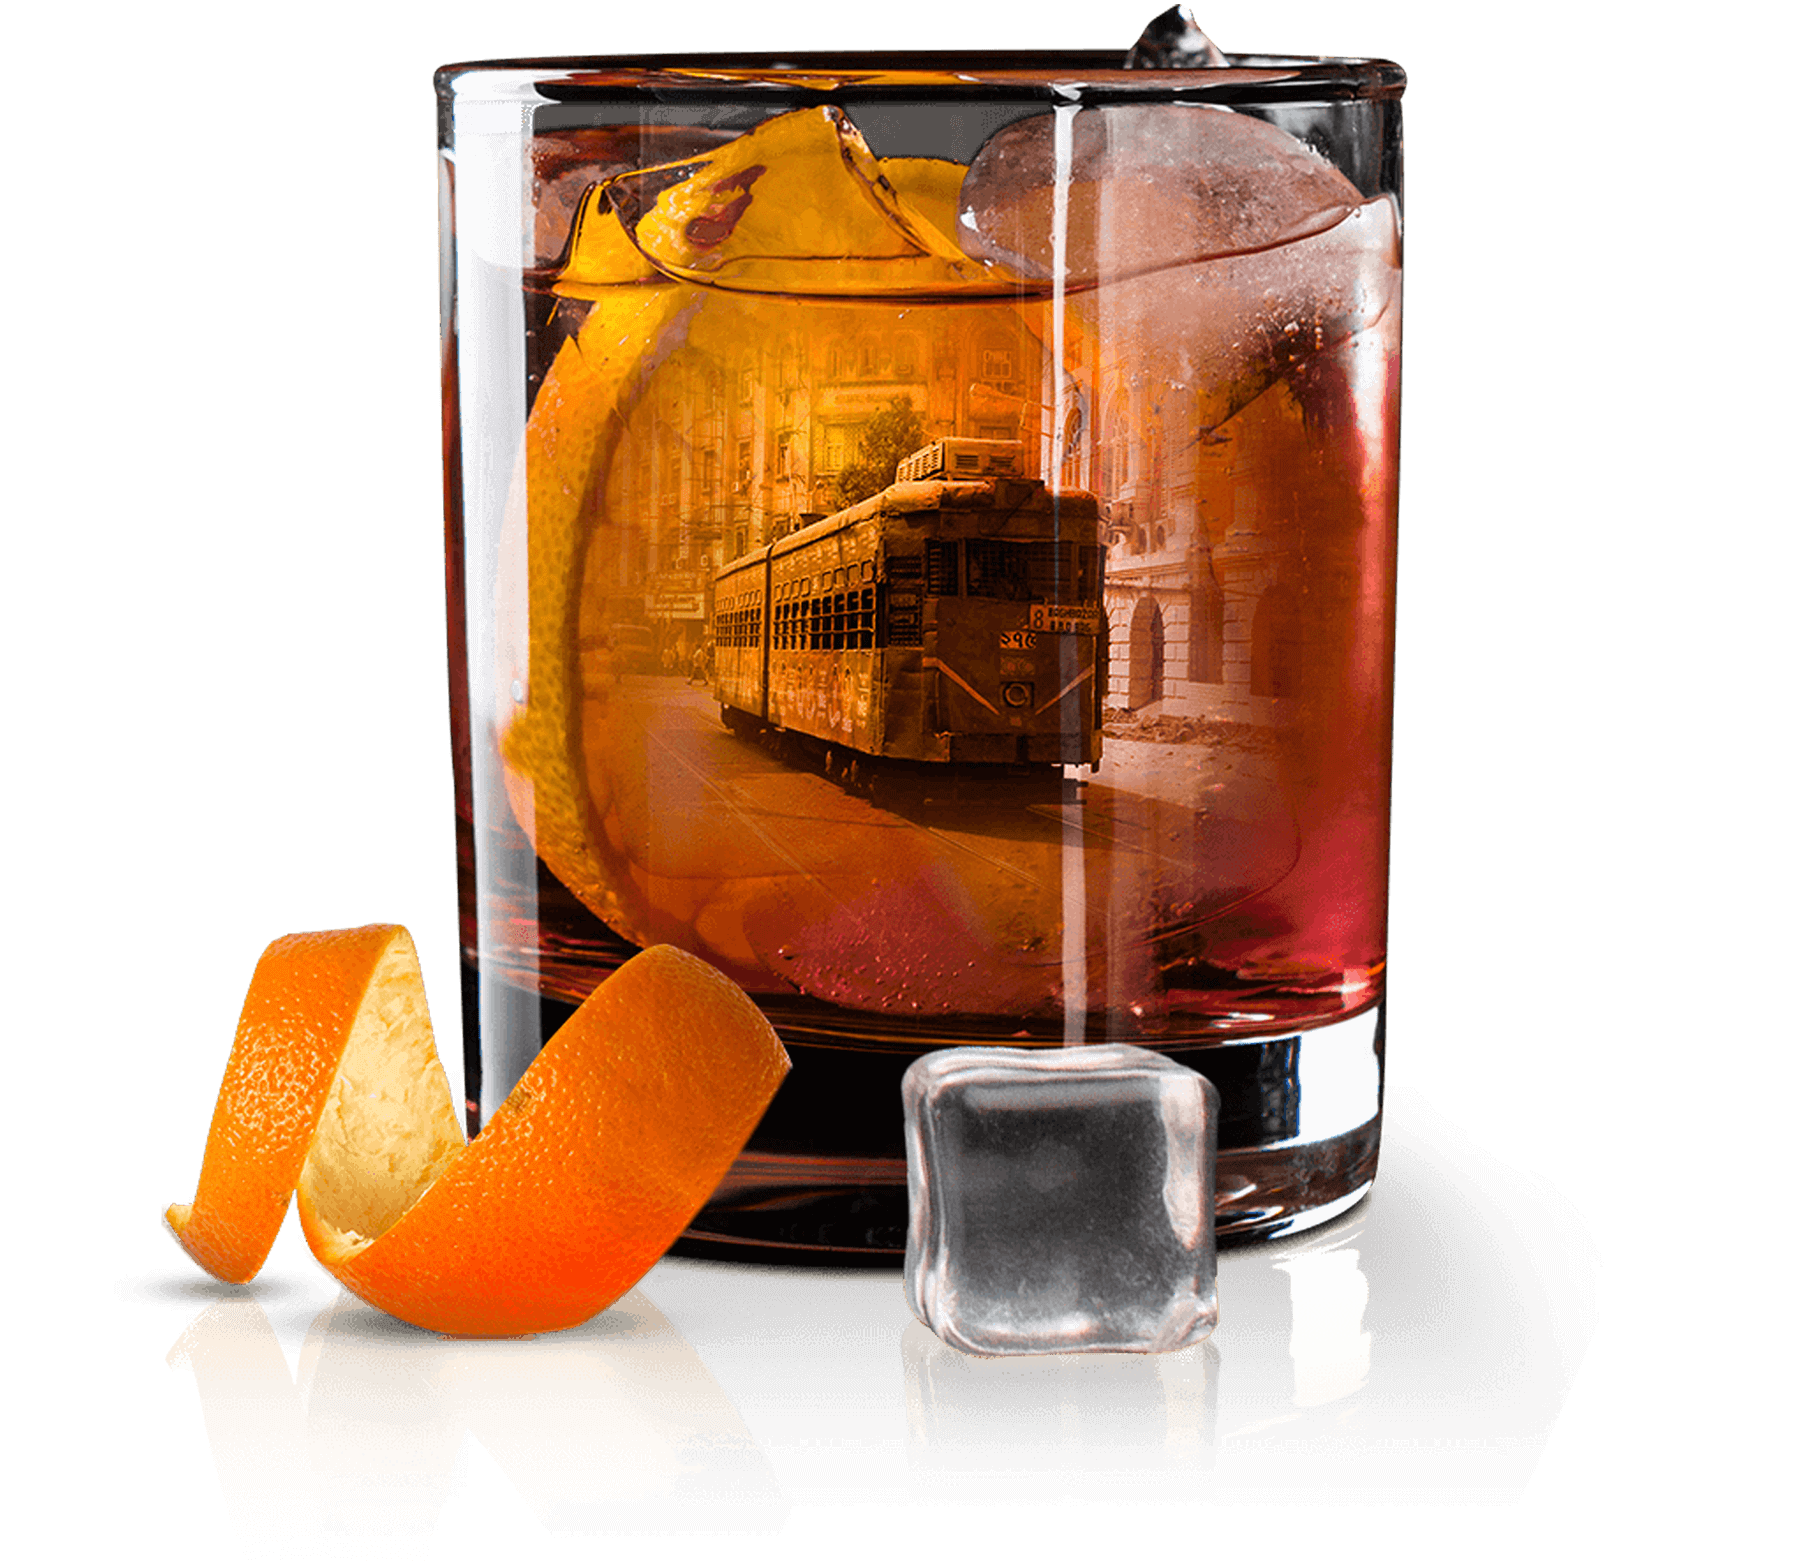 oaksmith gold kolkata inspired cocktail